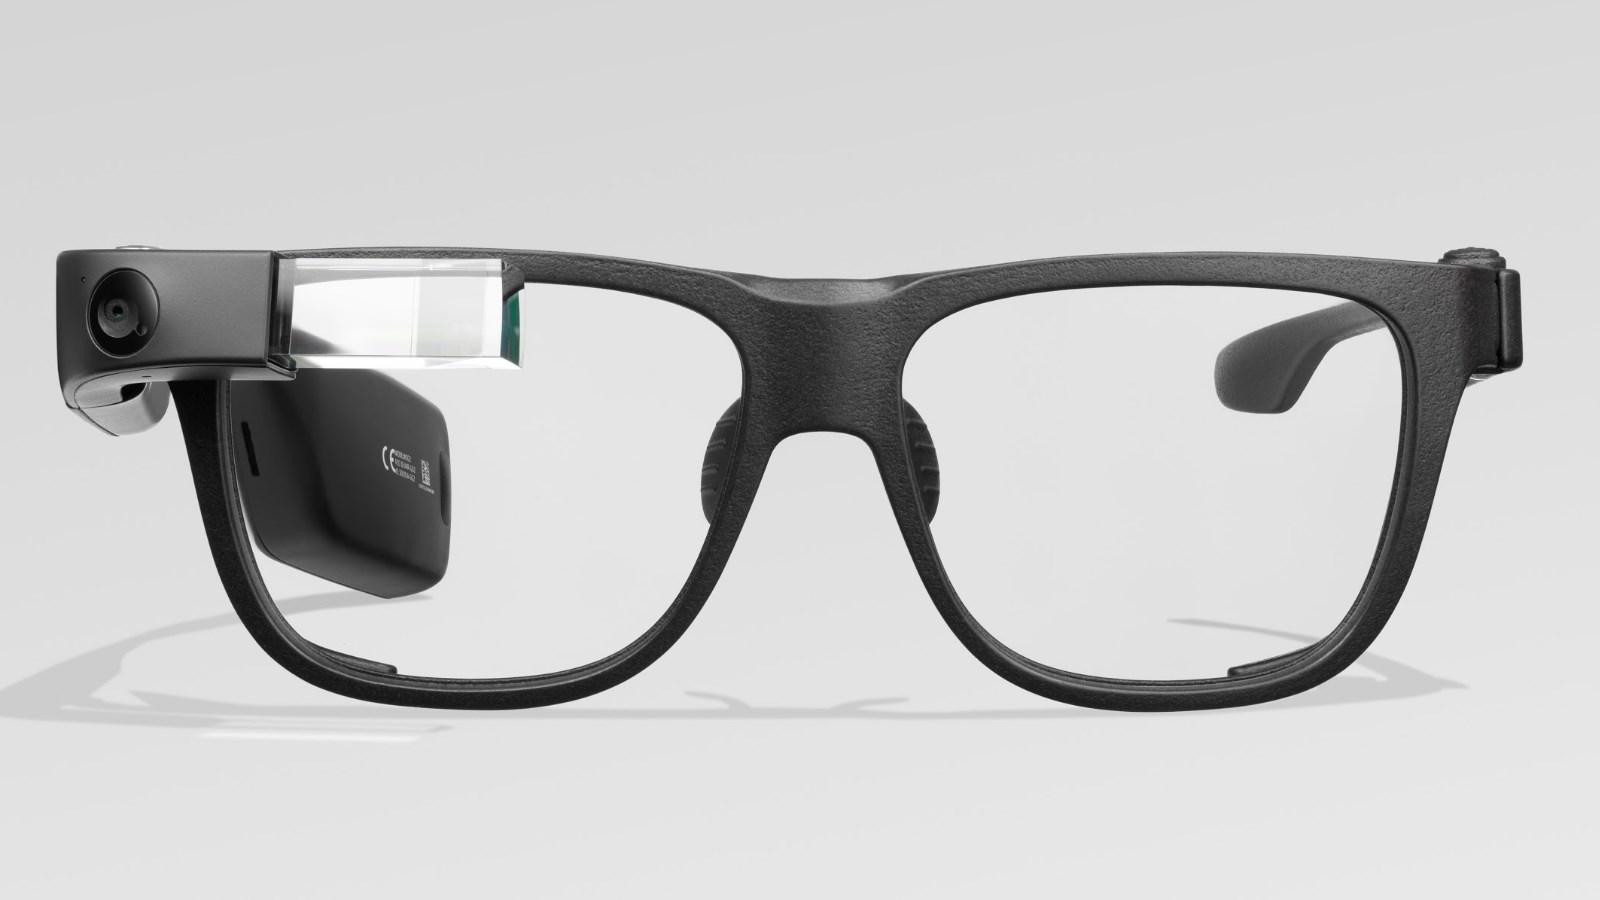 Glass Enterprise Edition 2. Image Credit: Google